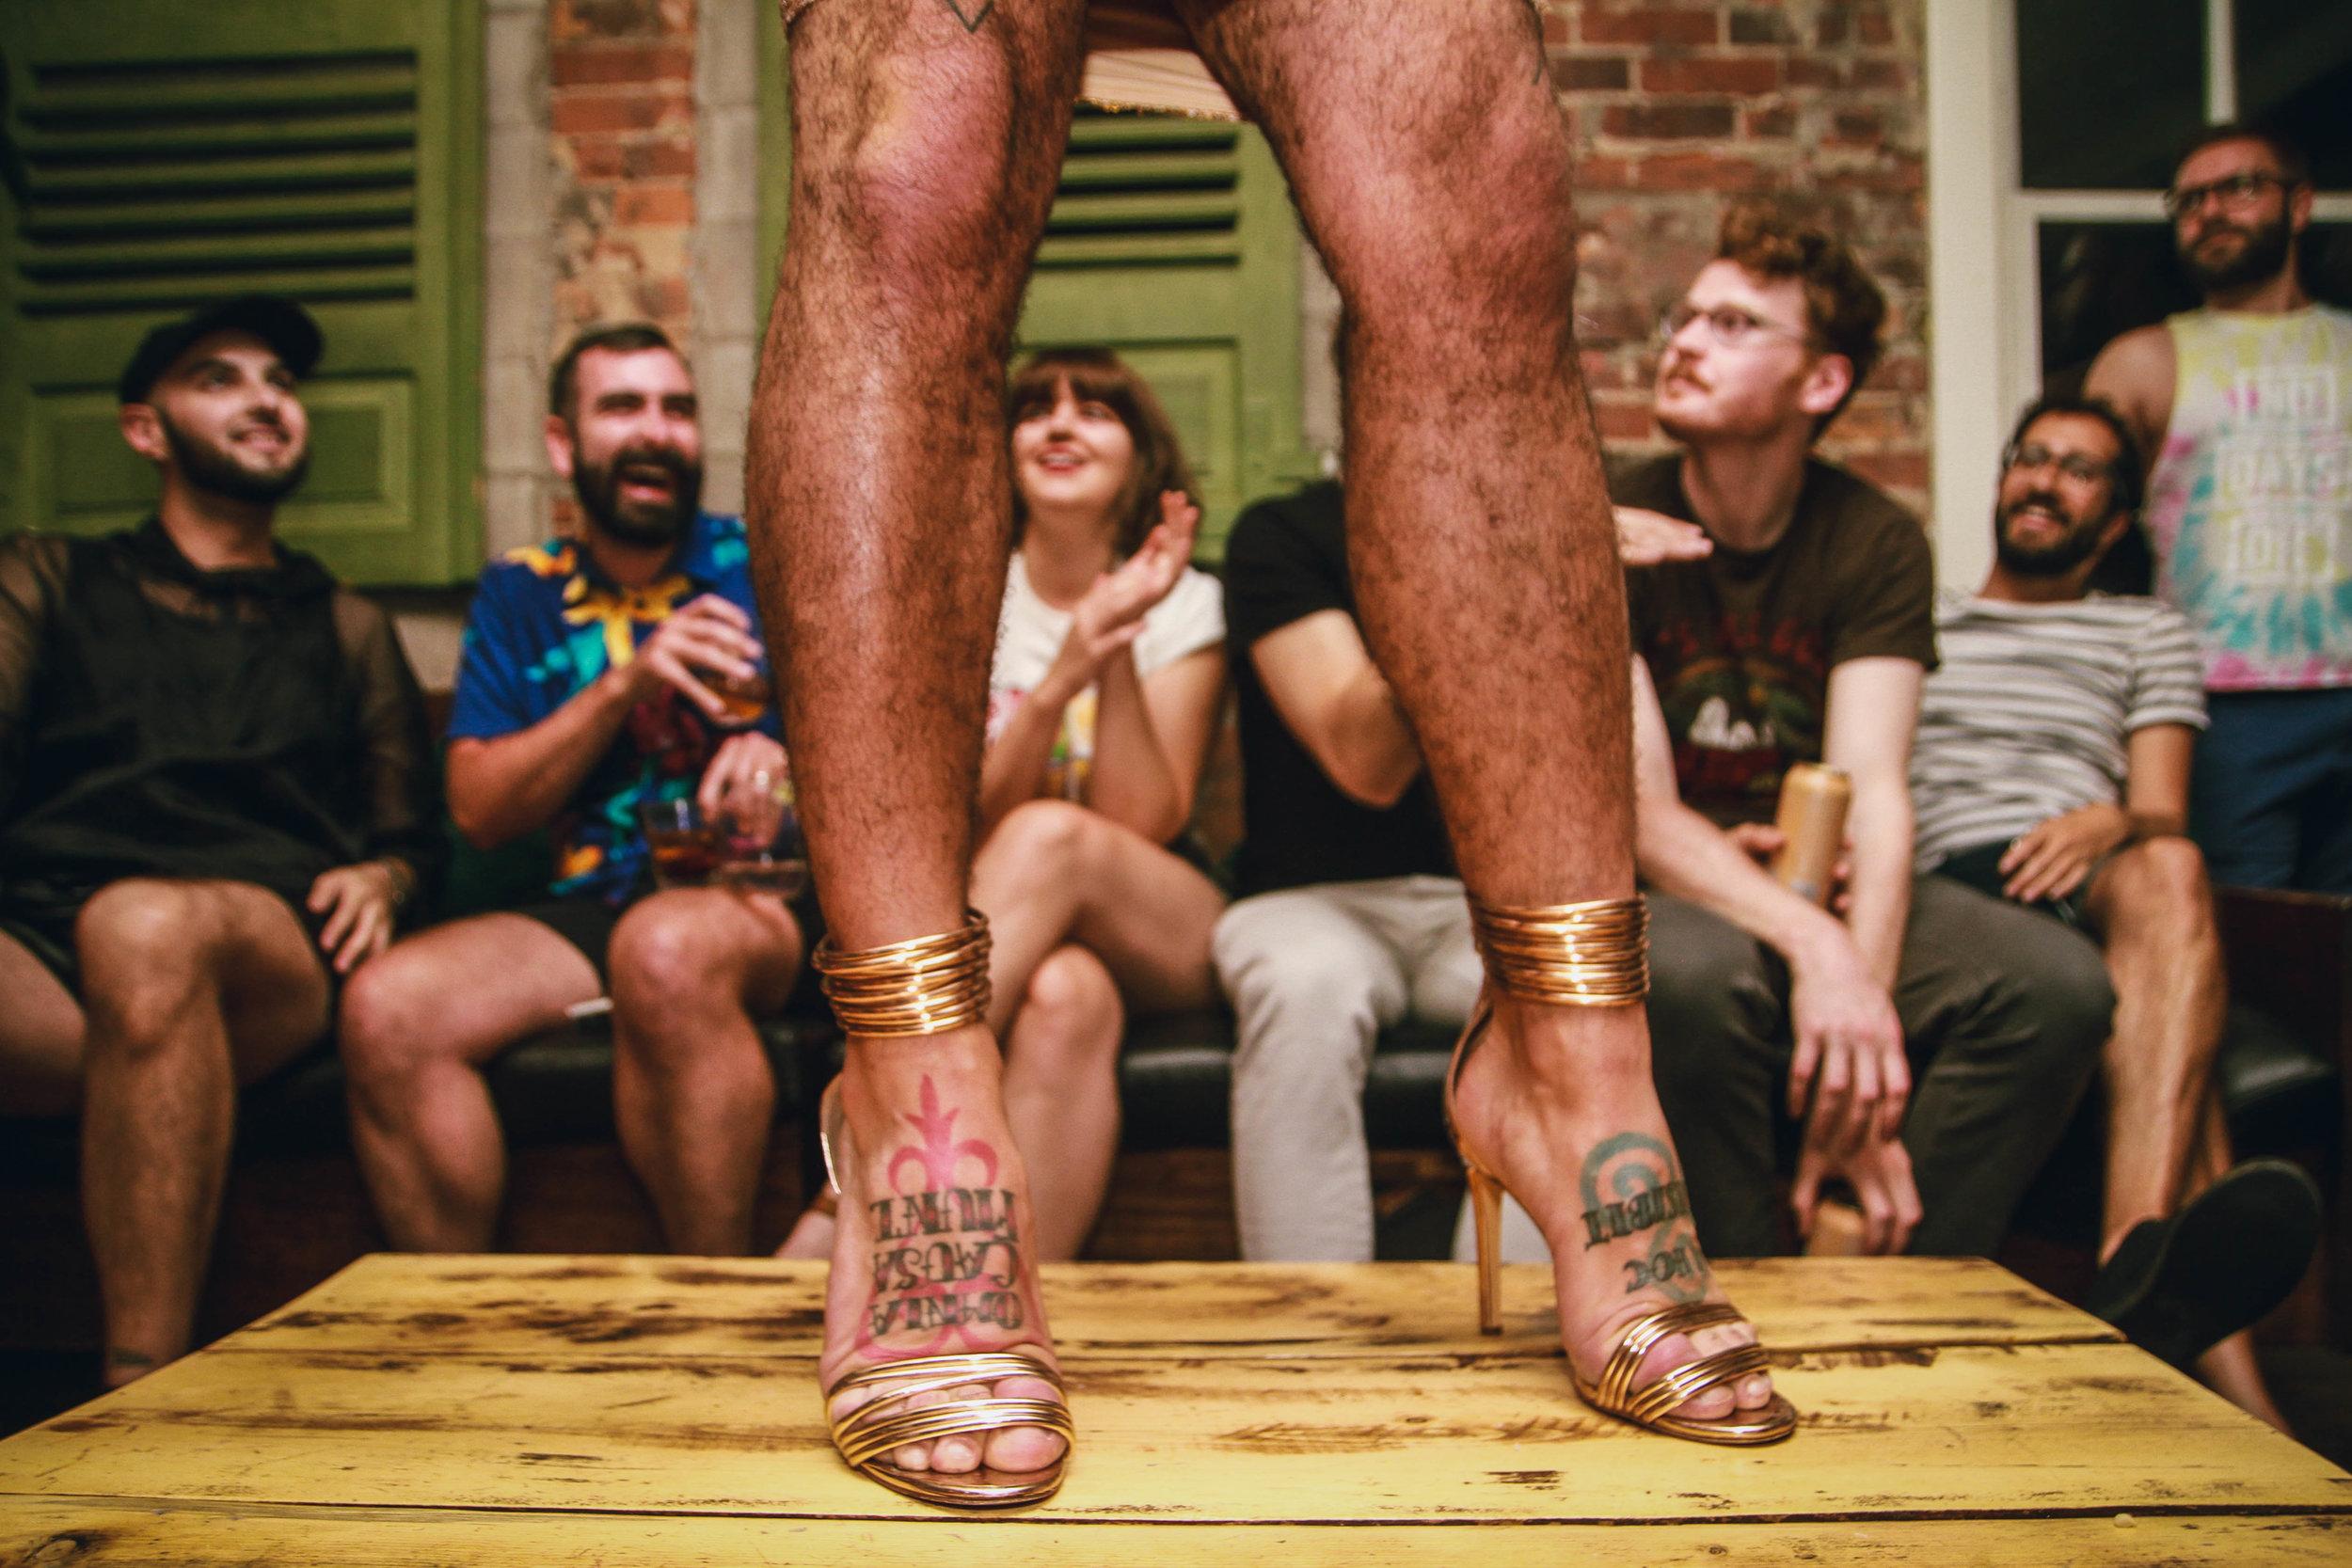 Gaybourhood Watch - Heels